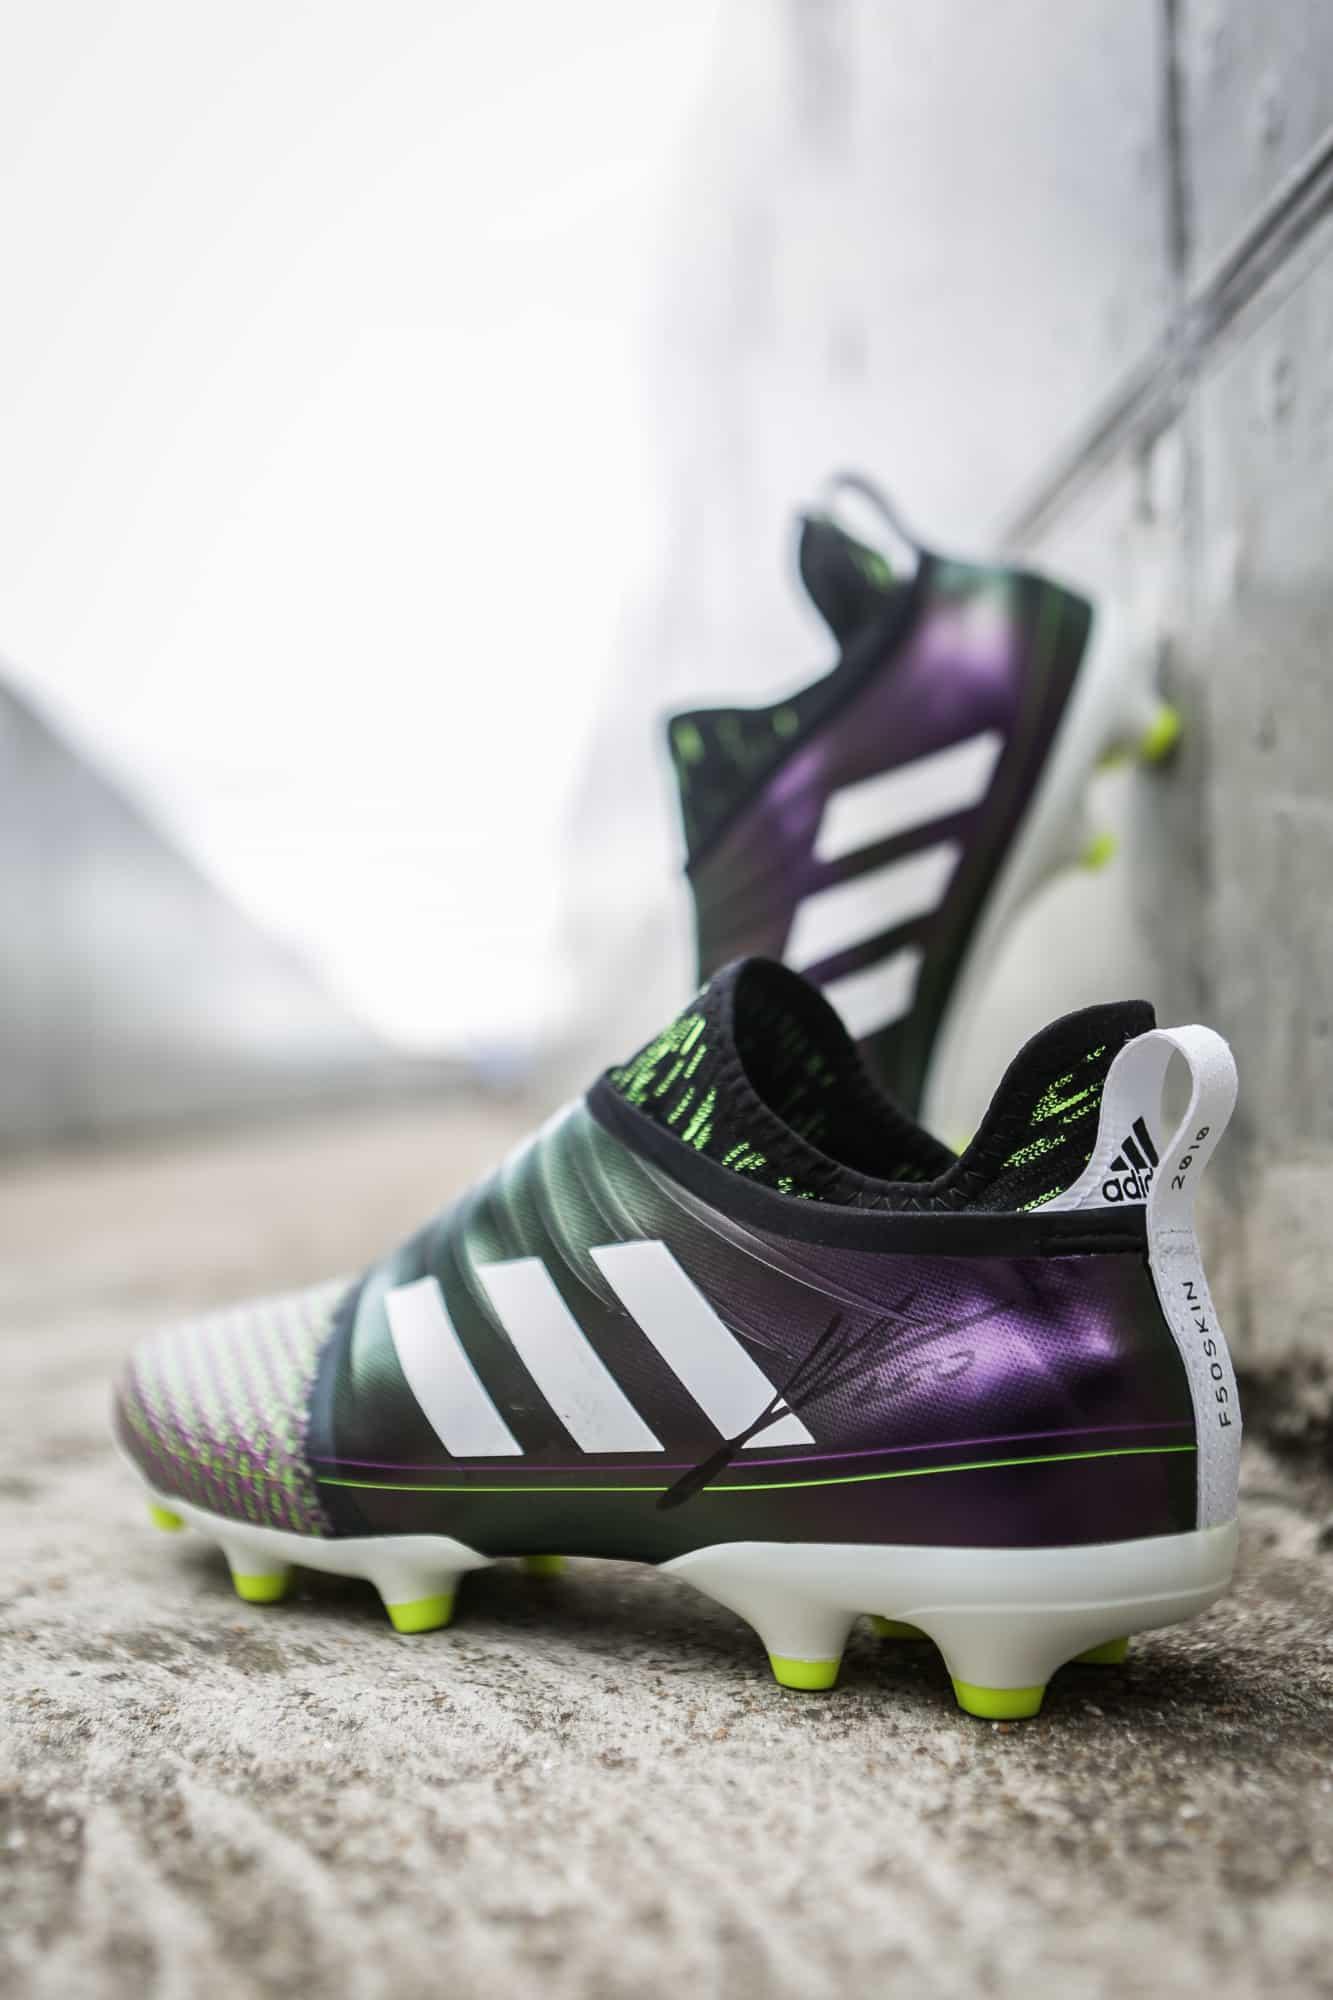 adidas-glitch-skin-F50-lionel-messi-footpack-1